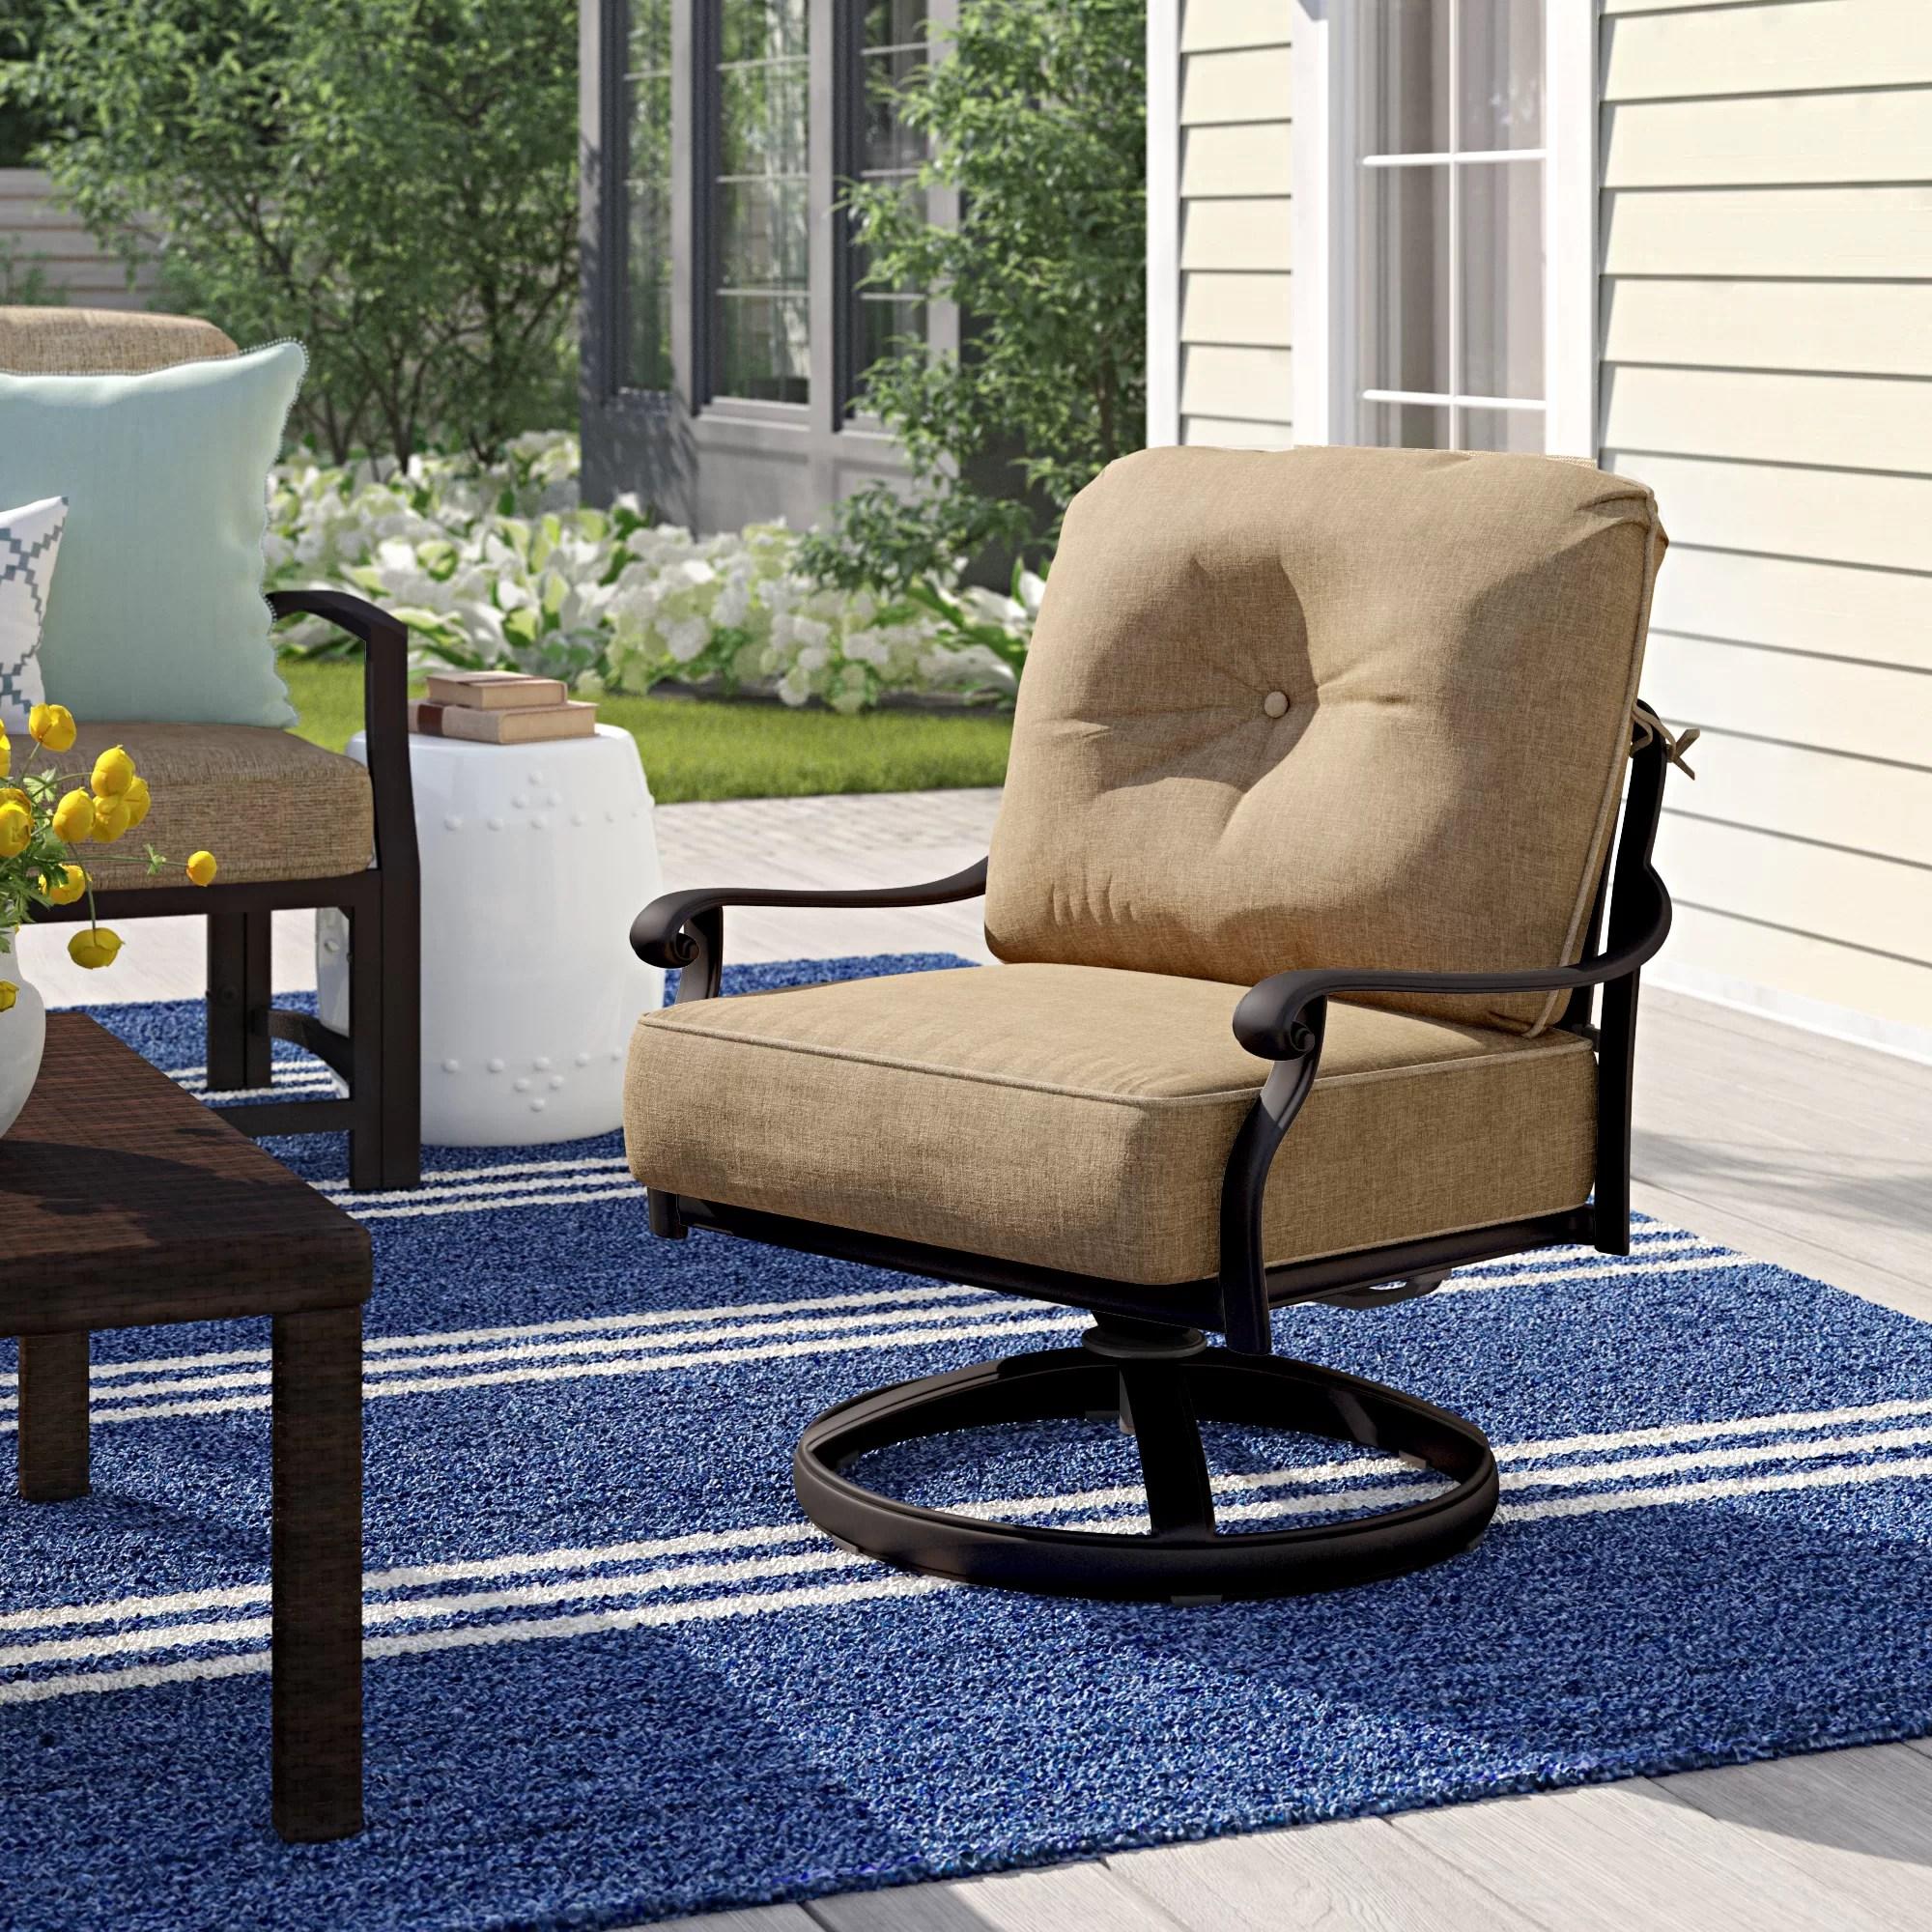 lebanon swivel rocker club patio chair with cushions